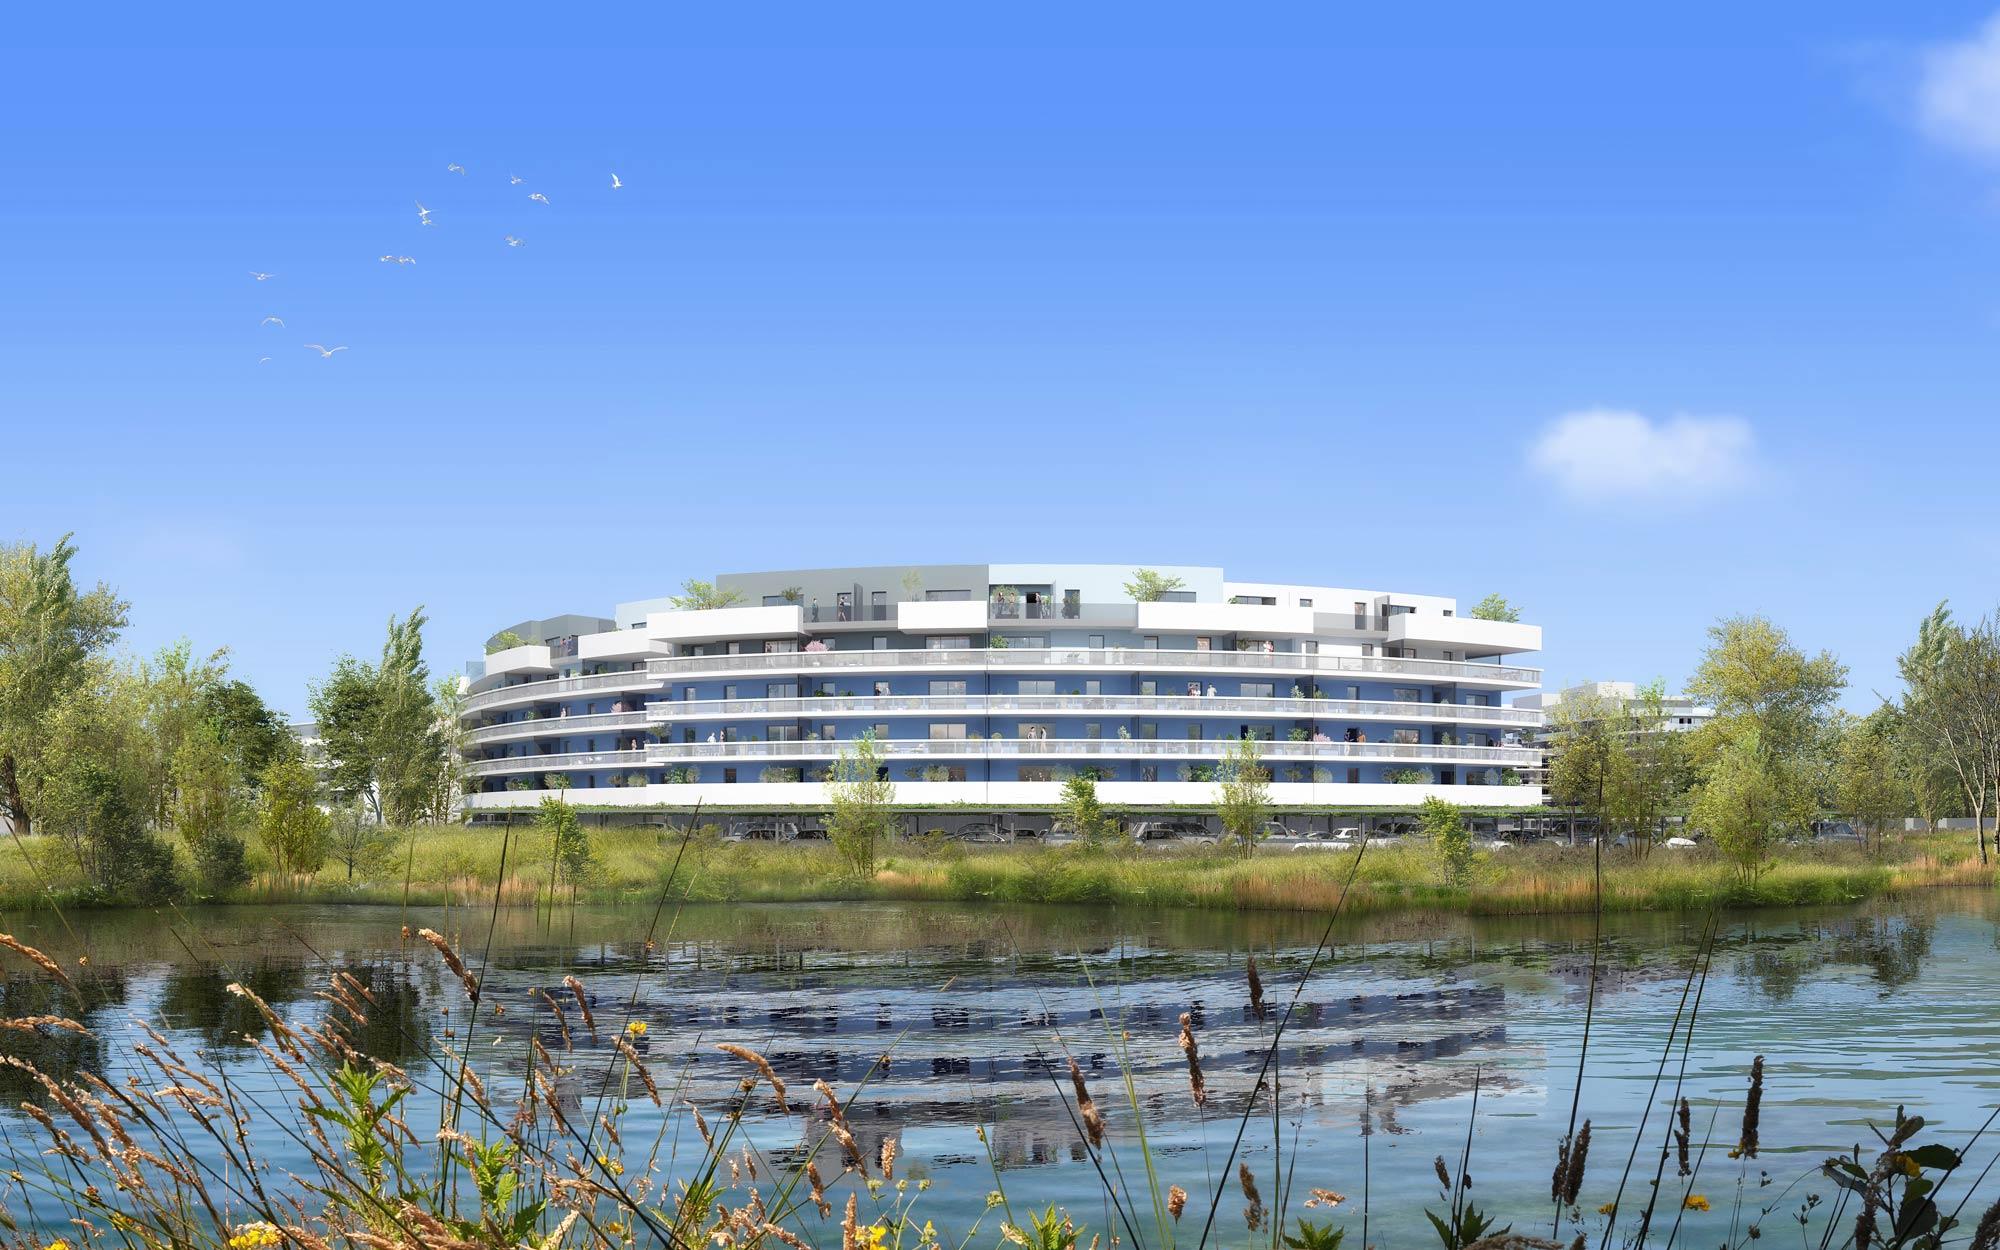 residence-bleu-odyssee-canet